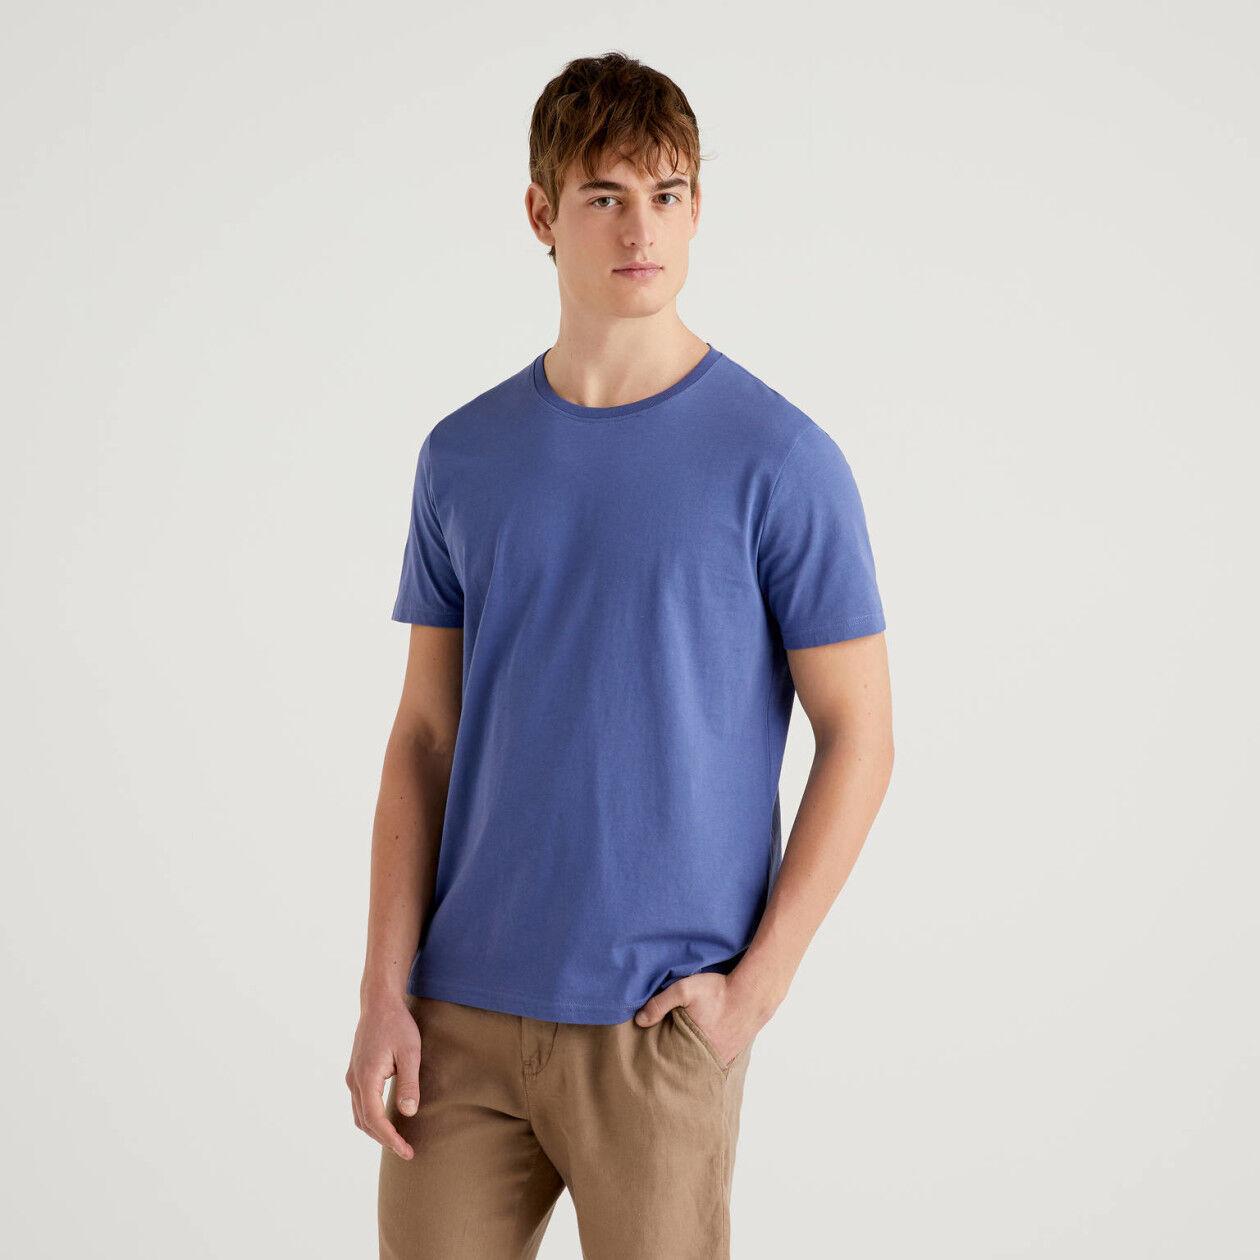 Camiseta azul de algodón puro